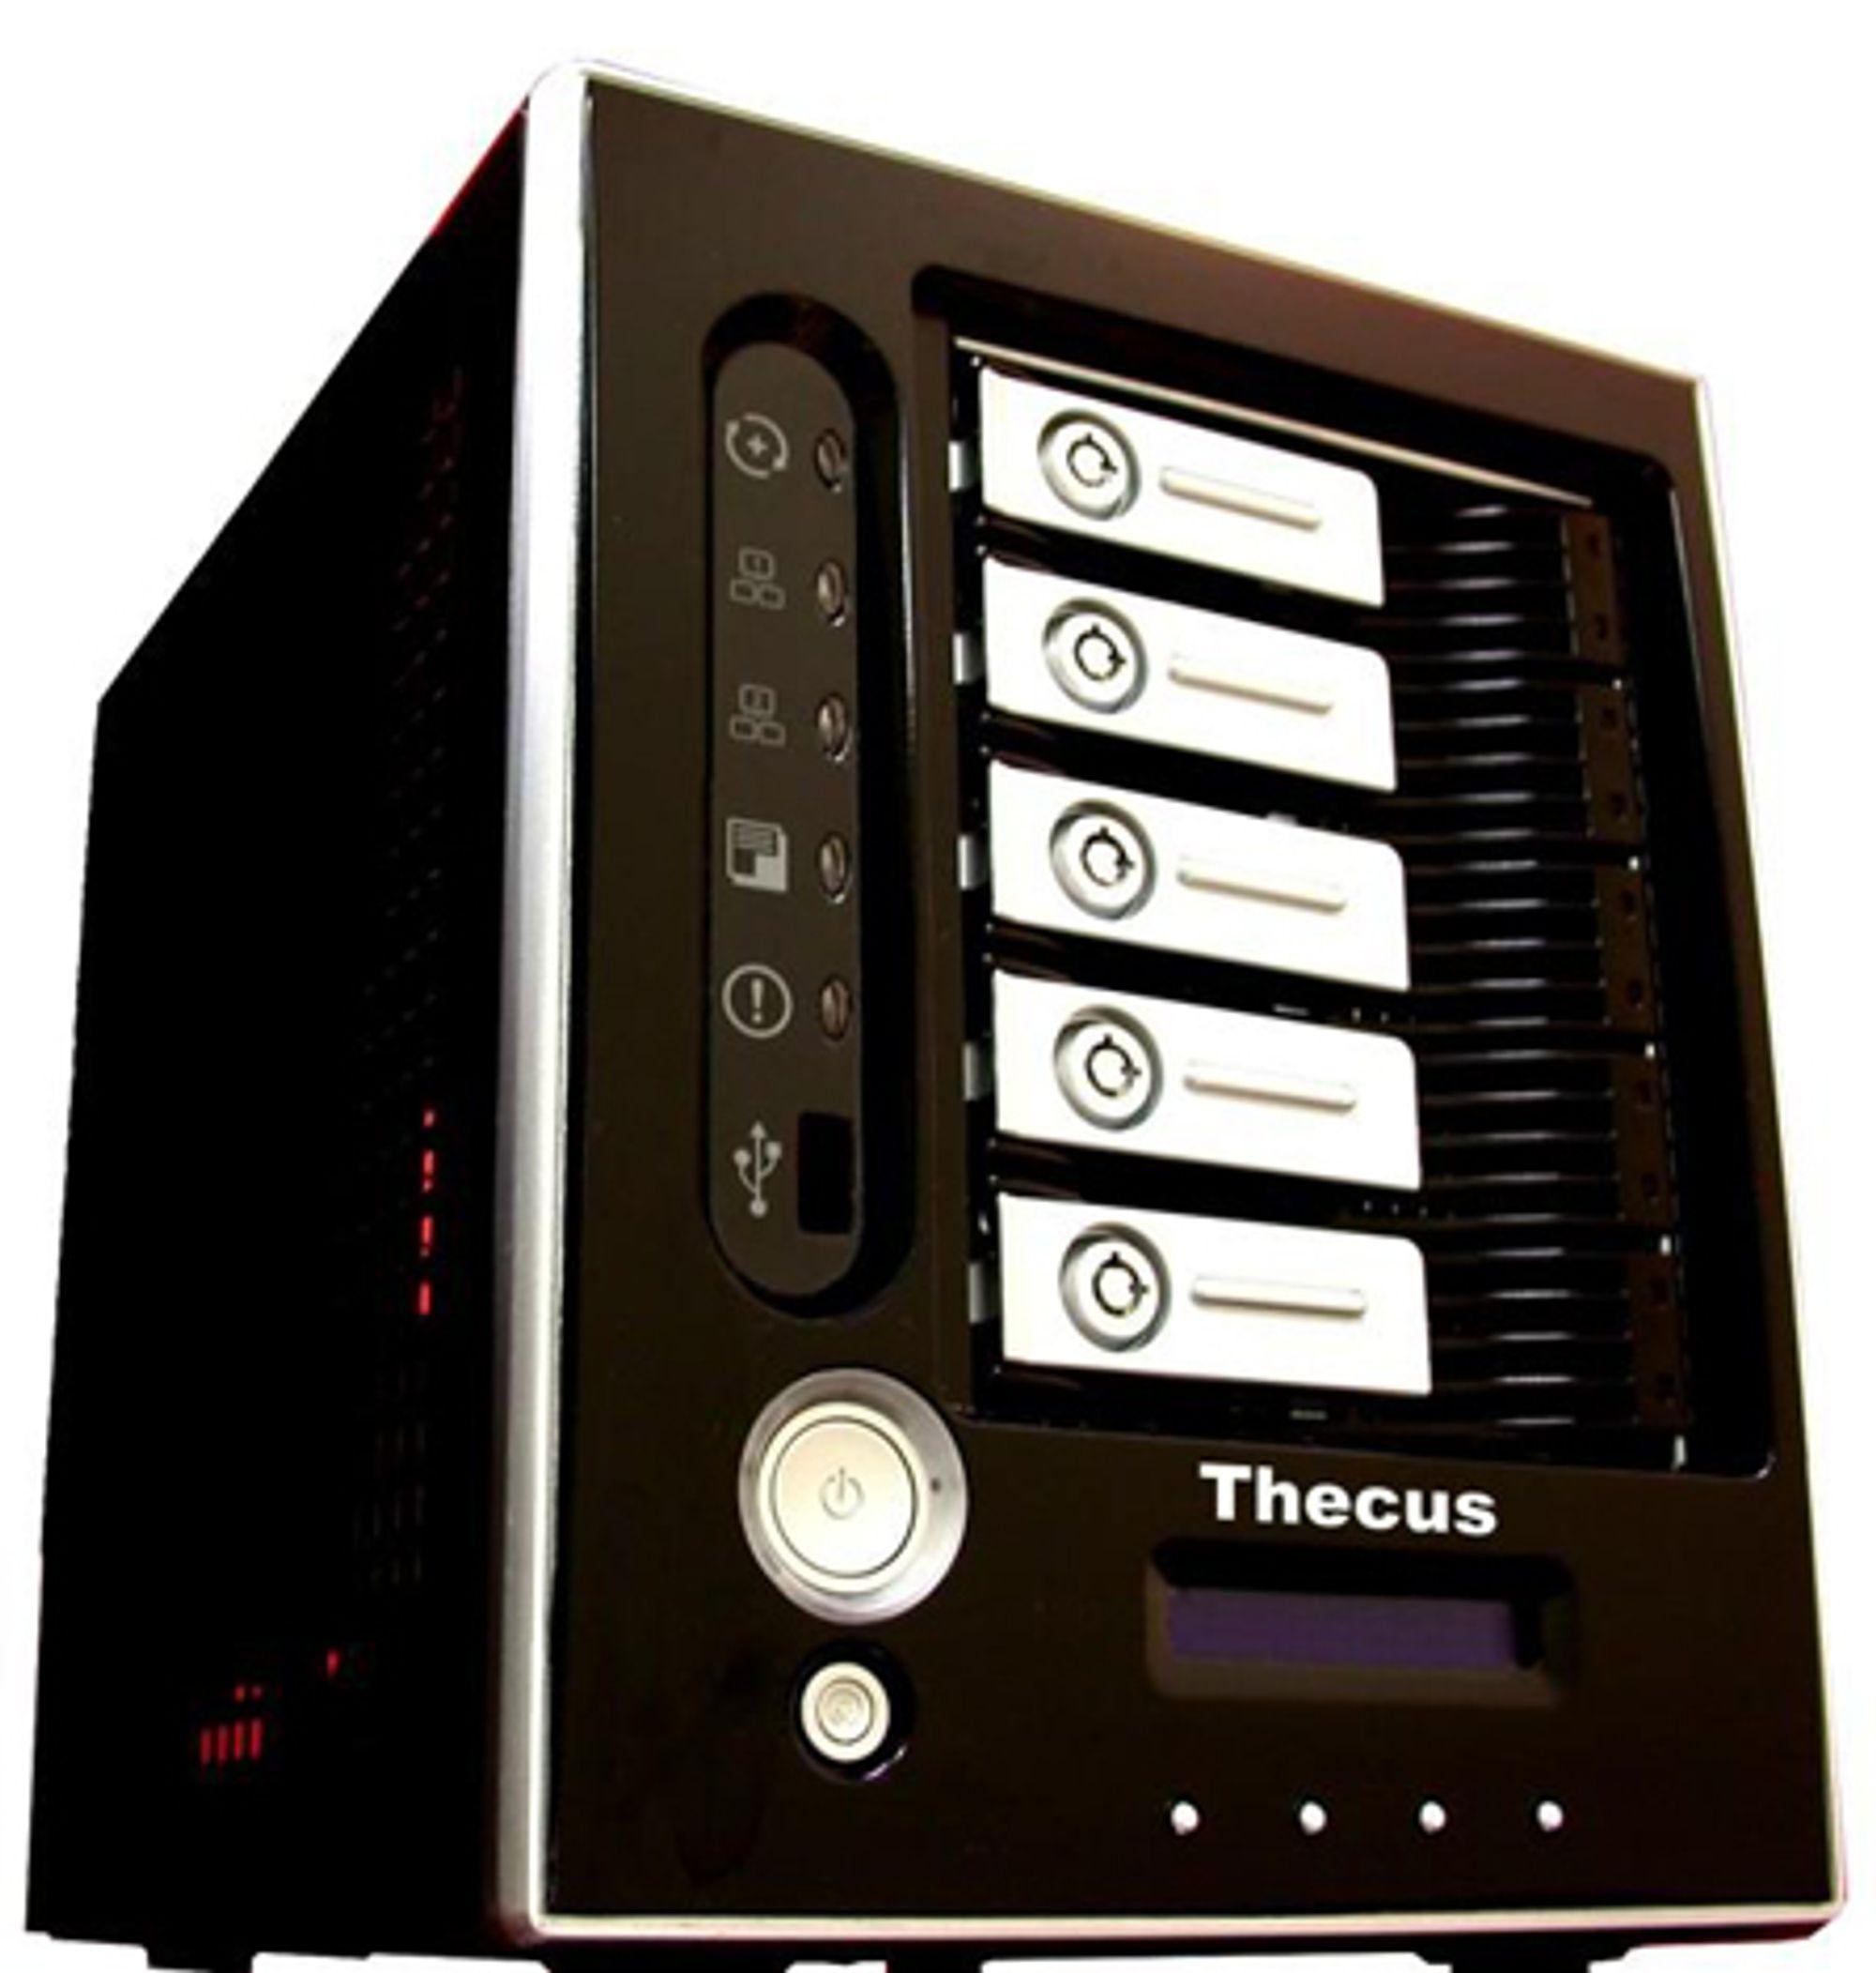 Thecus N5200 PRO